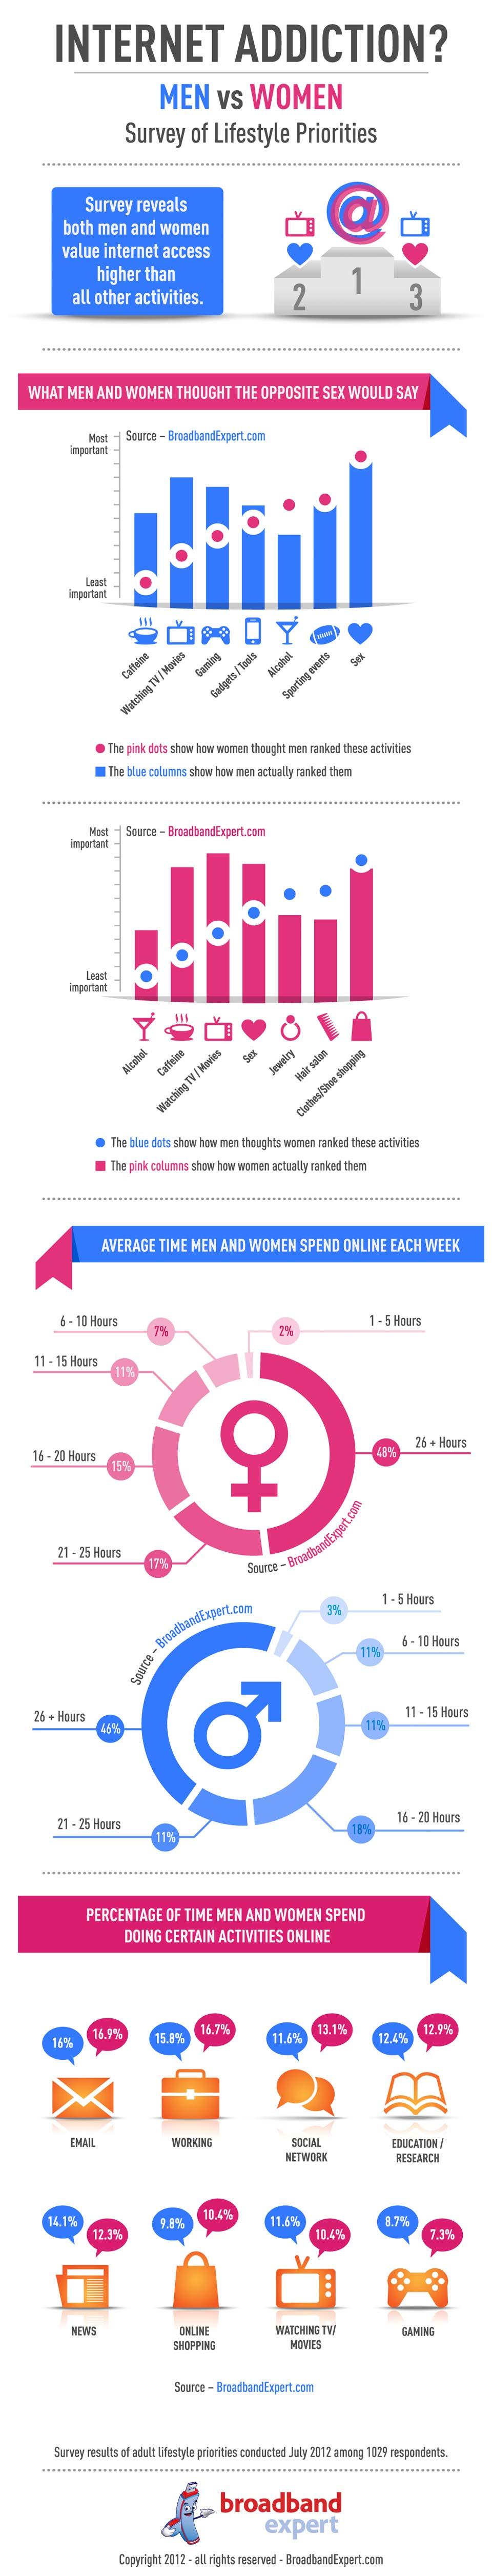 Internet Usage by Gender 2012-Infographic